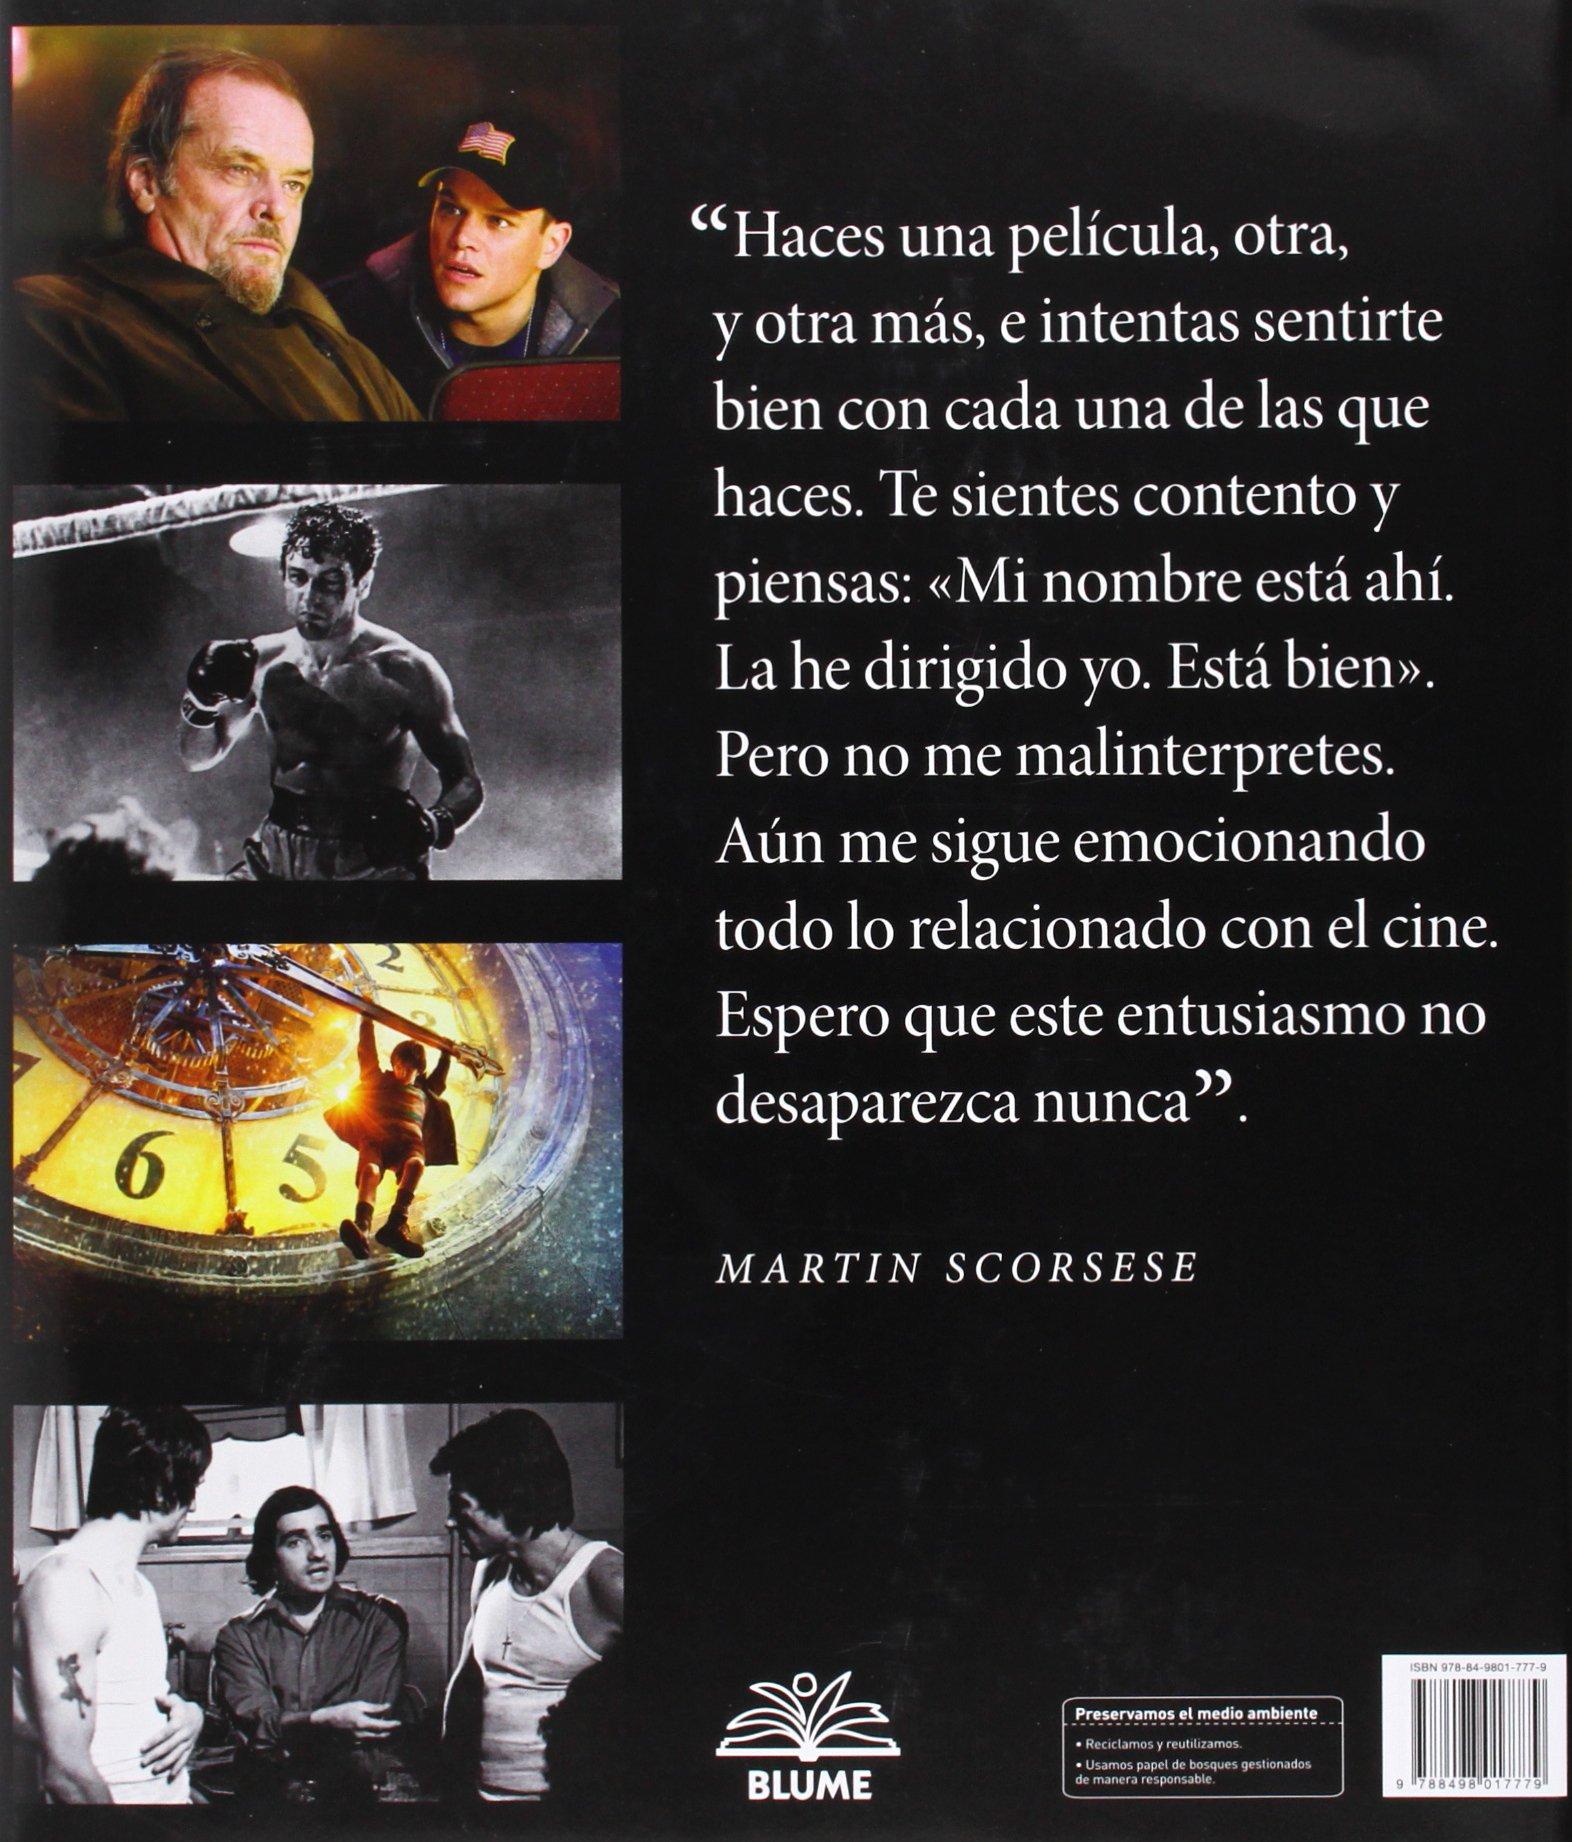 Martin Scorsese: Una retrospectiva: Amazon.es: Shone, Tom, Rodríguez Fischer, Cristina, Esteve de Udaeta, Llorenç, Cano Camarasa, Rosa: Libros